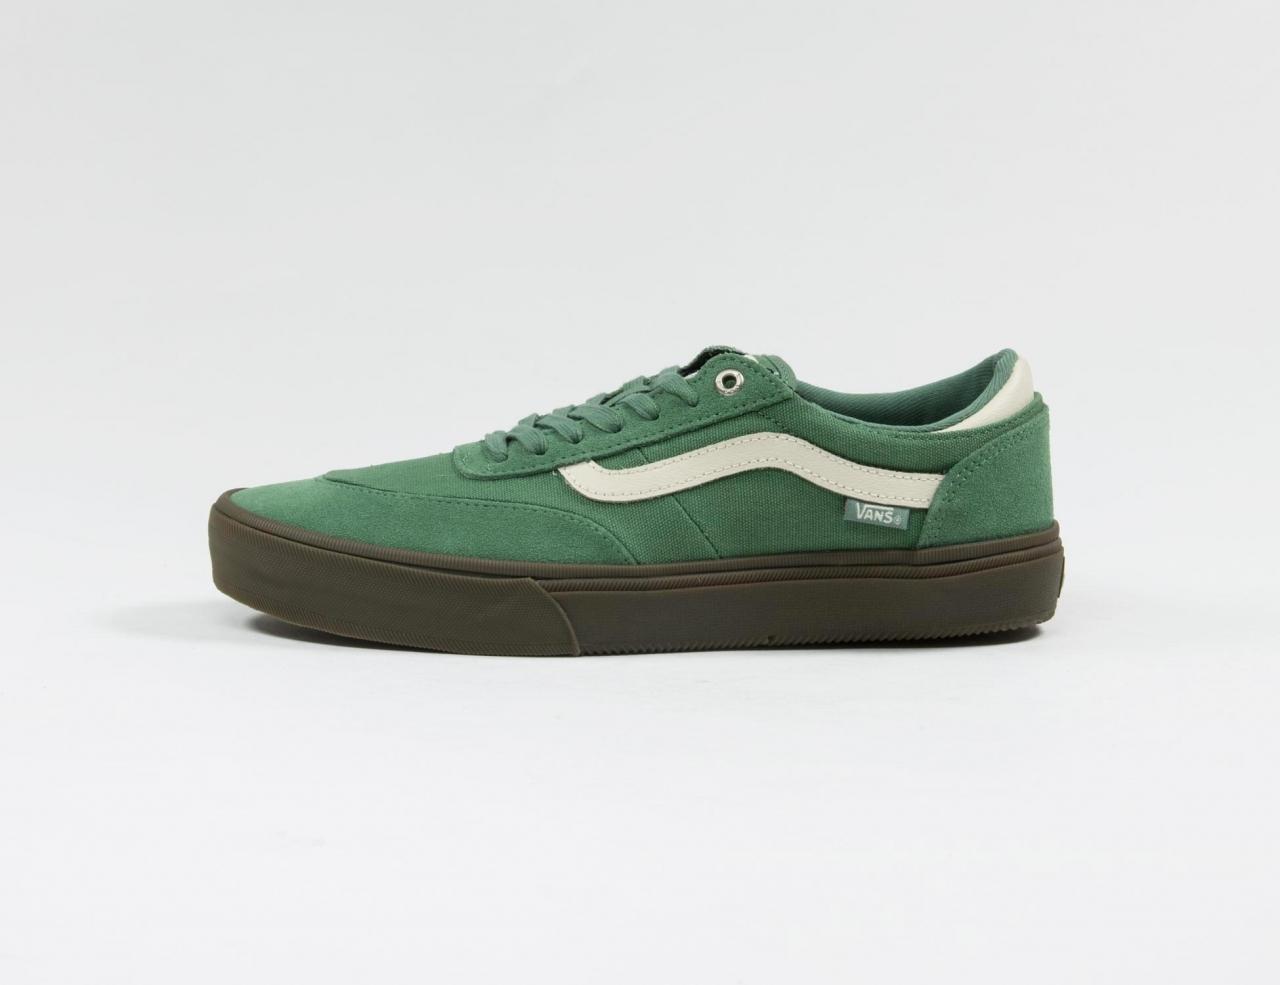 VANS Gilbert Crockett 2 Pro Sneaker - (Dark Gum) Hedge Green